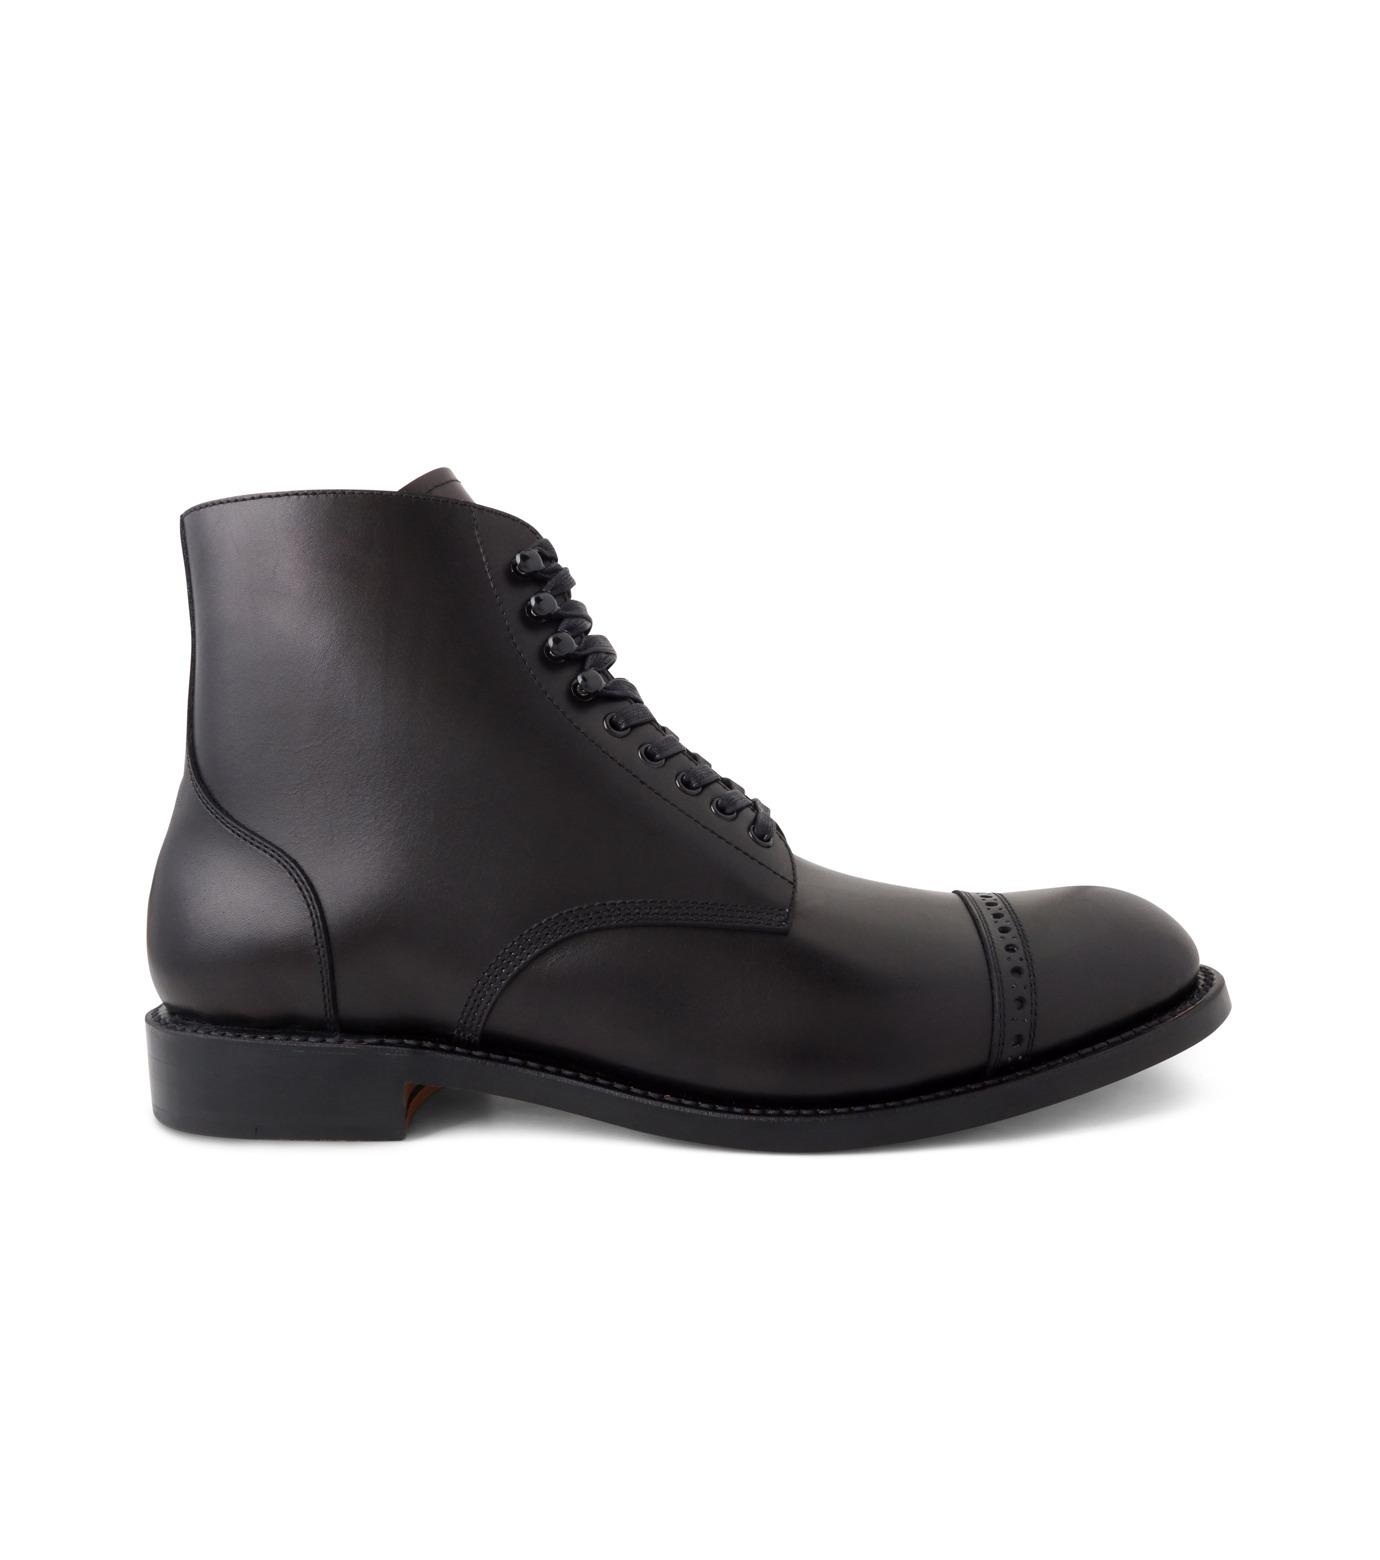 RAINMAKER(レインメーカー)のm42 boots-BLACK(ブーツ/boots)-RM162-019-13 拡大詳細画像1